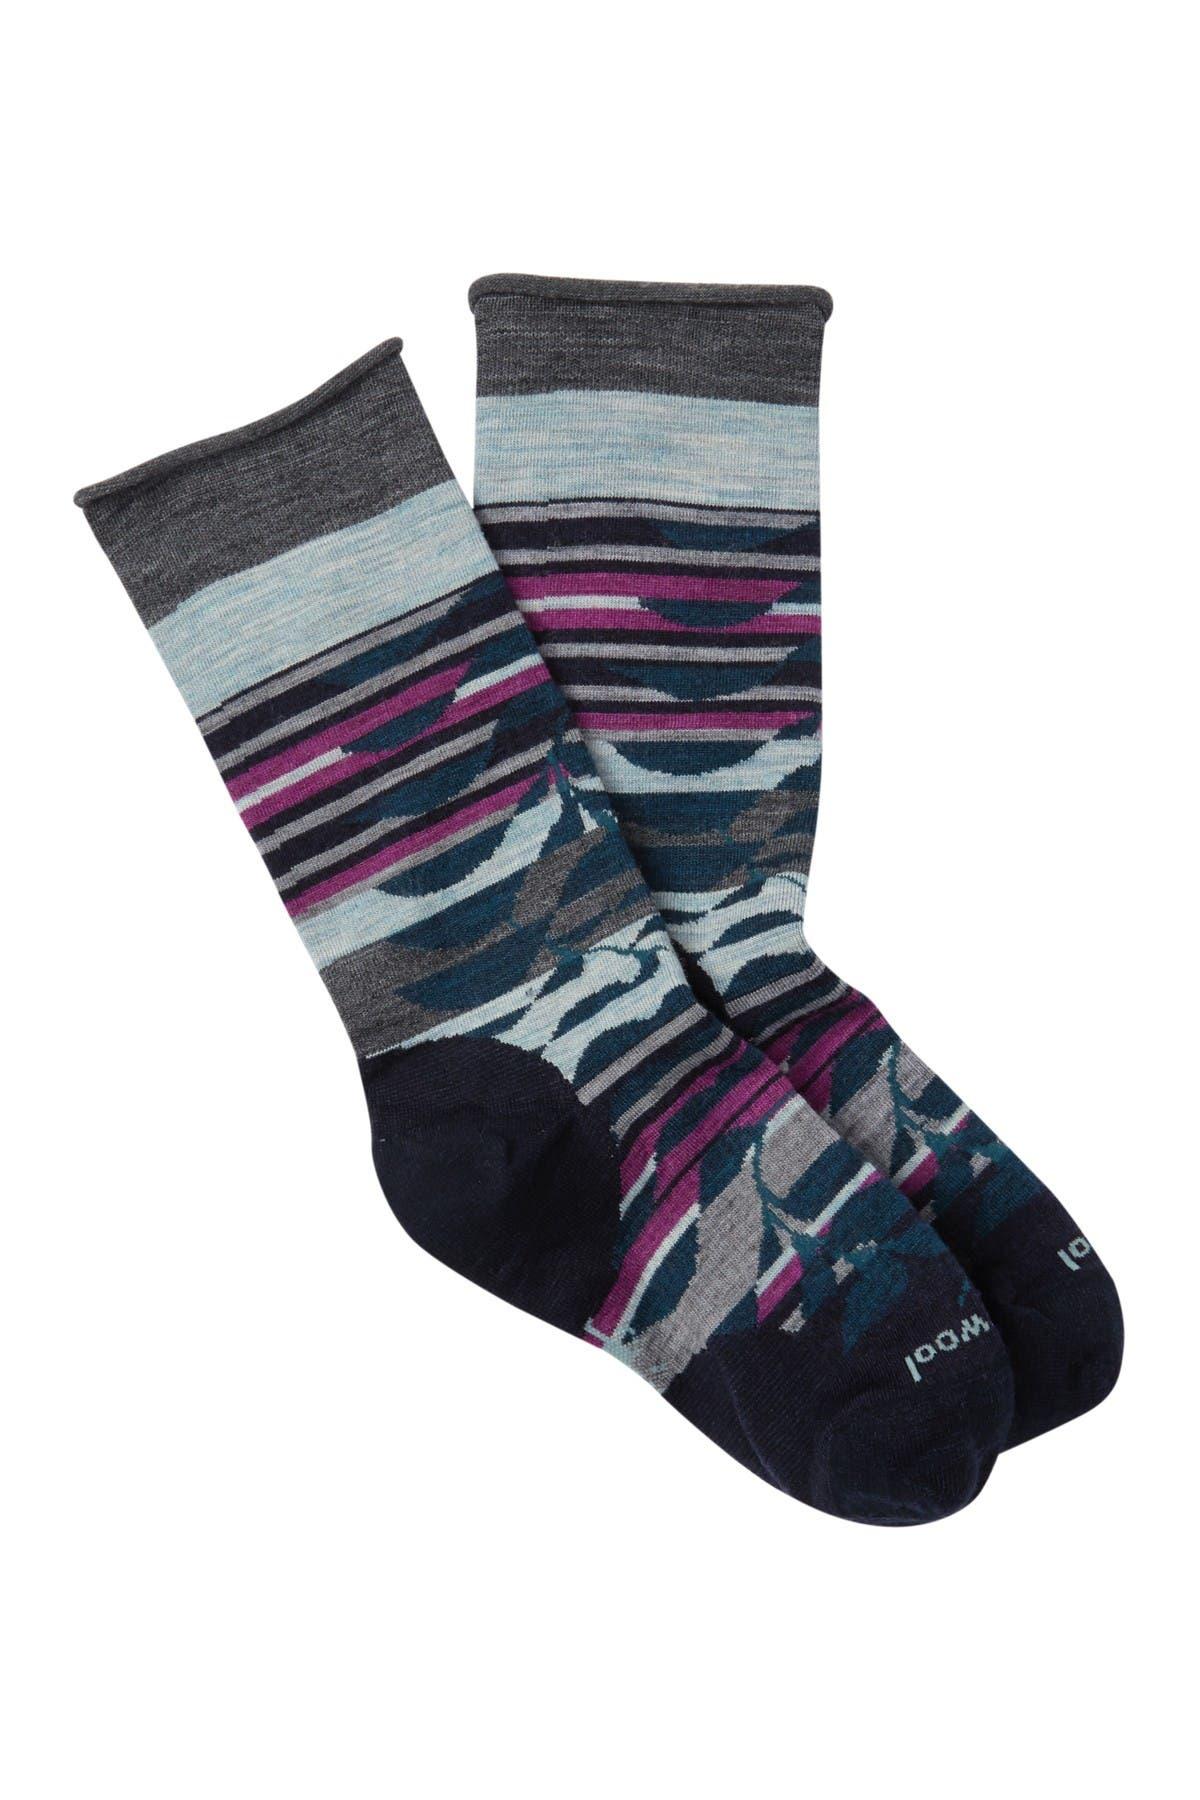 Image of SmartWool Pressure Free Palm Crew Socks